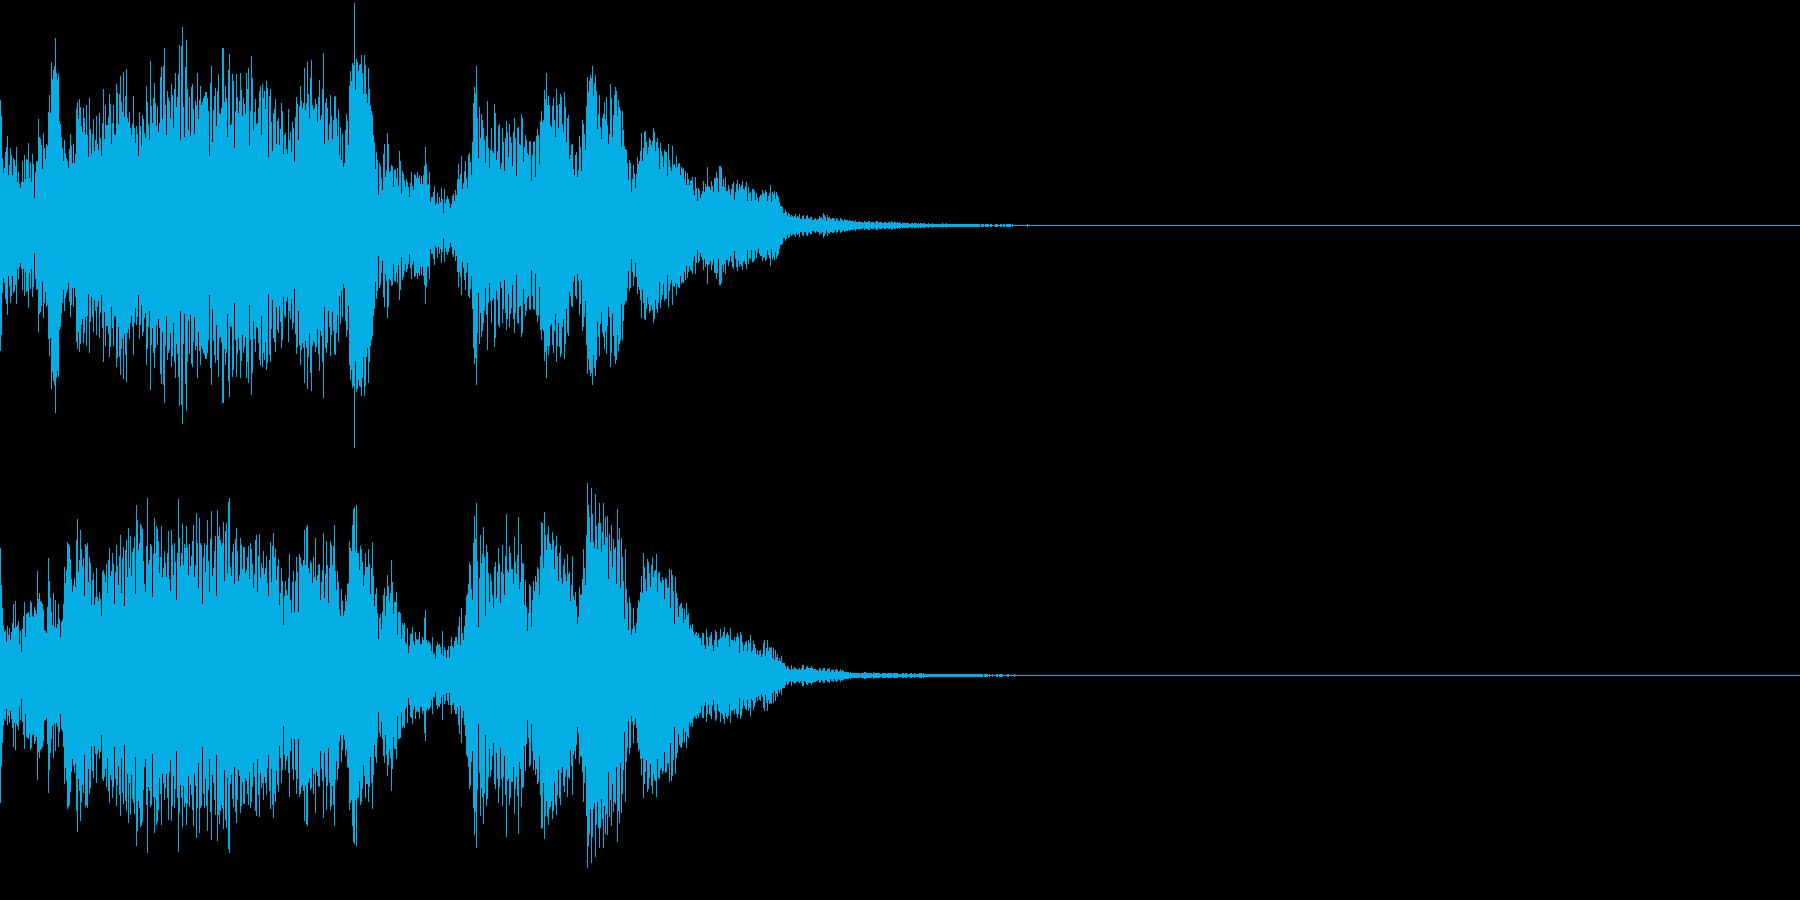 Monster 未知の生物の発する音声1の再生済みの波形